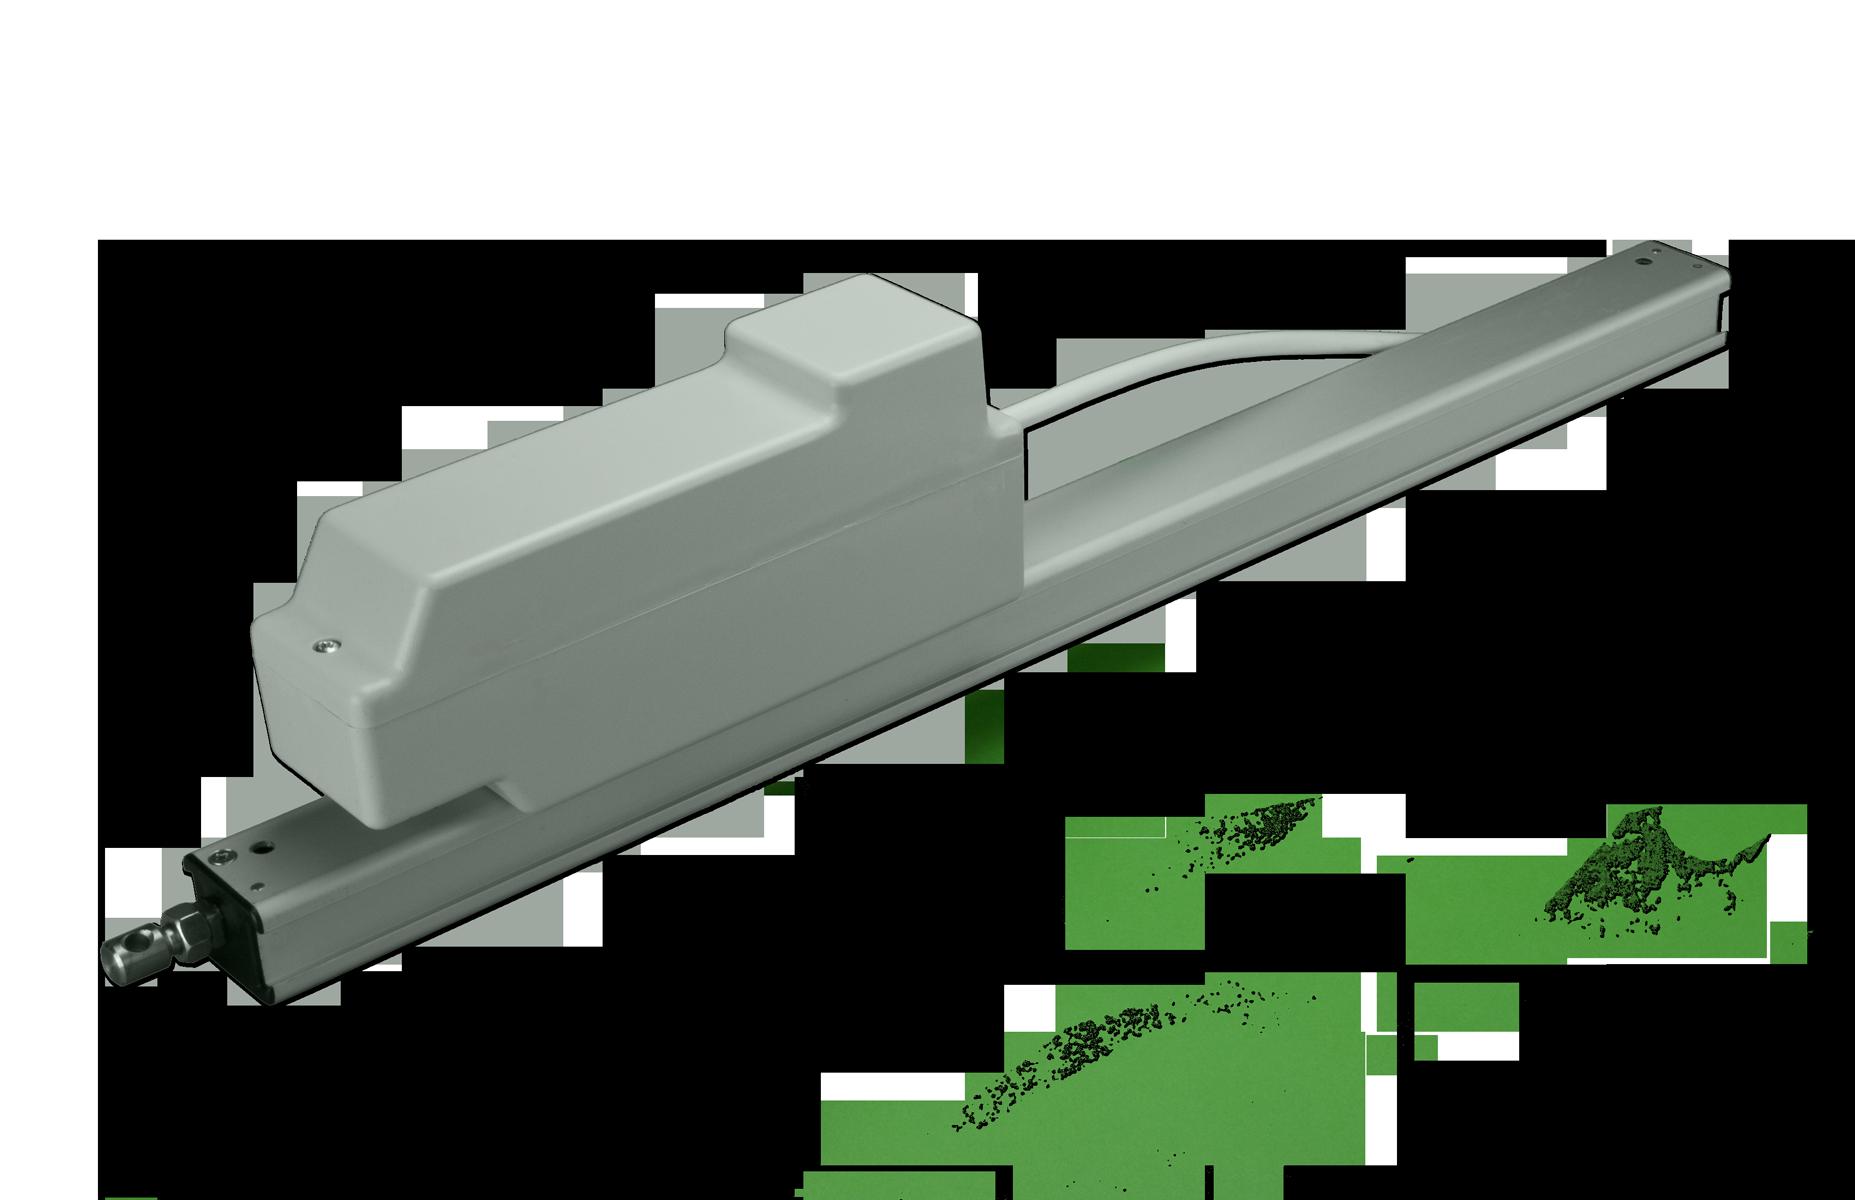 Photo of the gear rack actuator EA-SZ